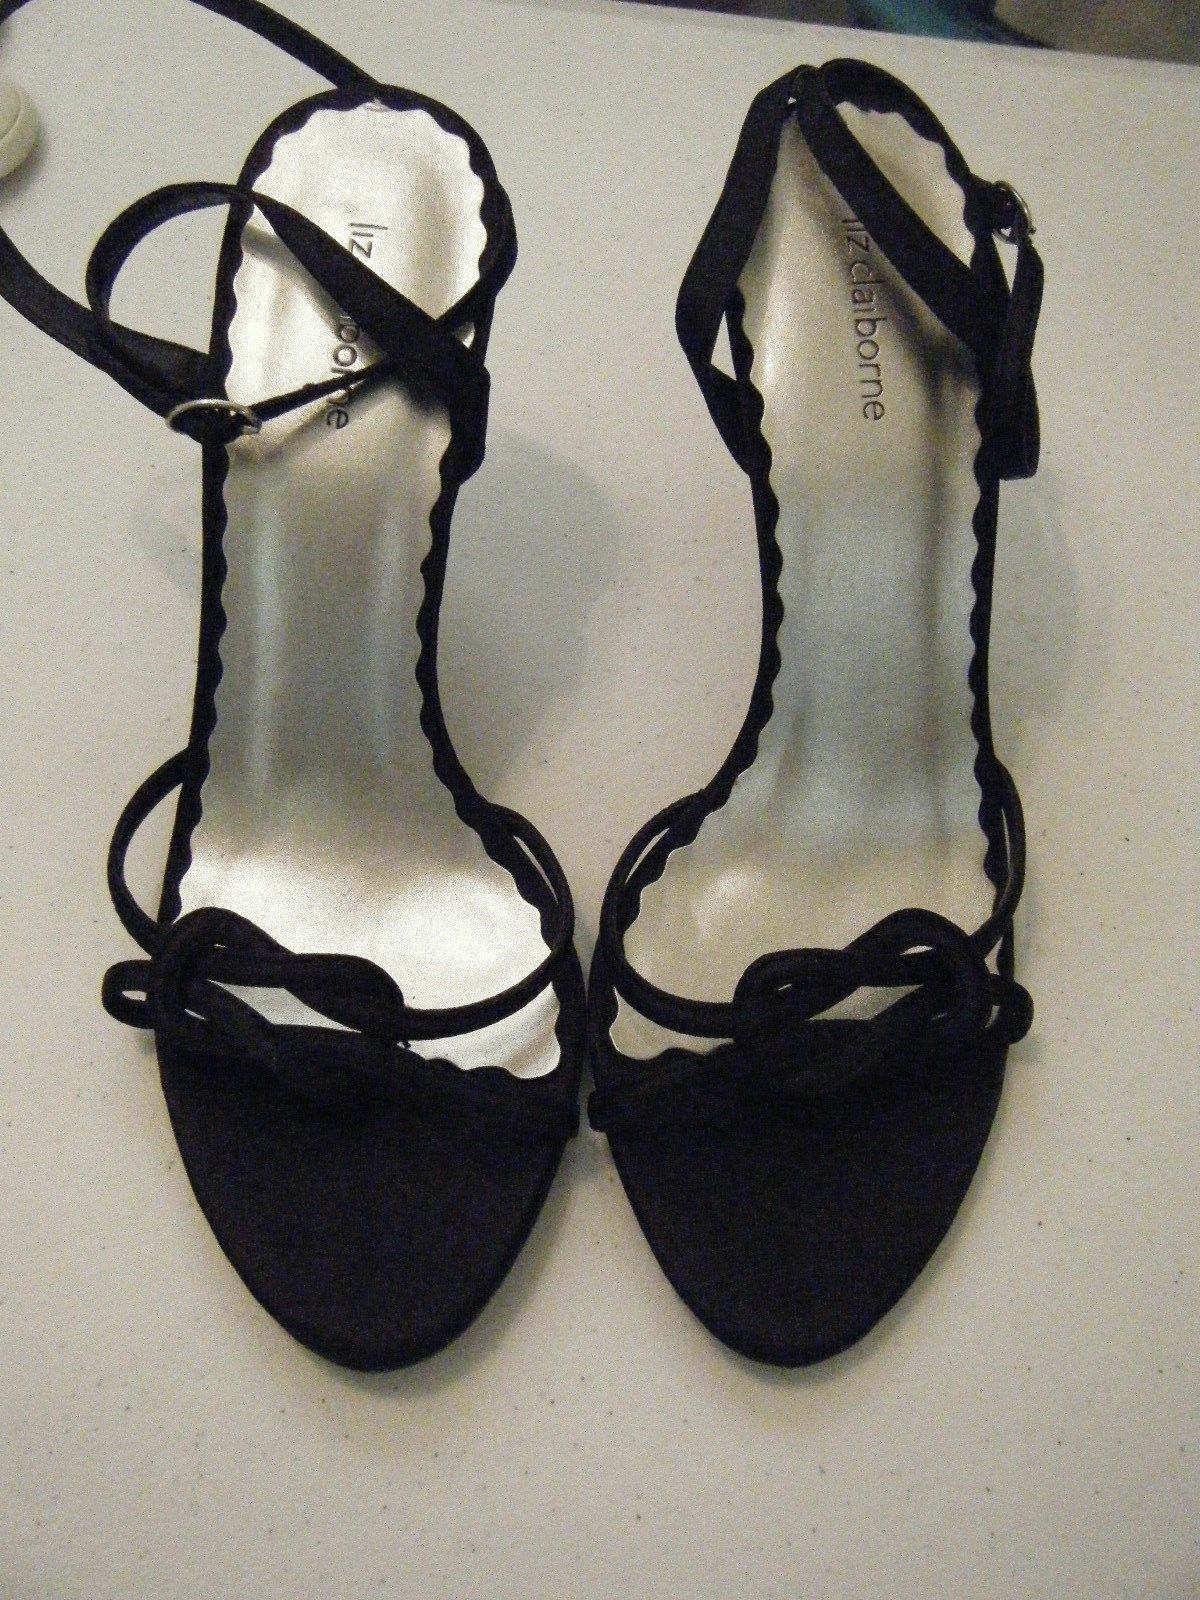 LIZ CLAIBORN BLACK DRESS SANDLES WITH ANKLE STRIP SIZE 9 NEW